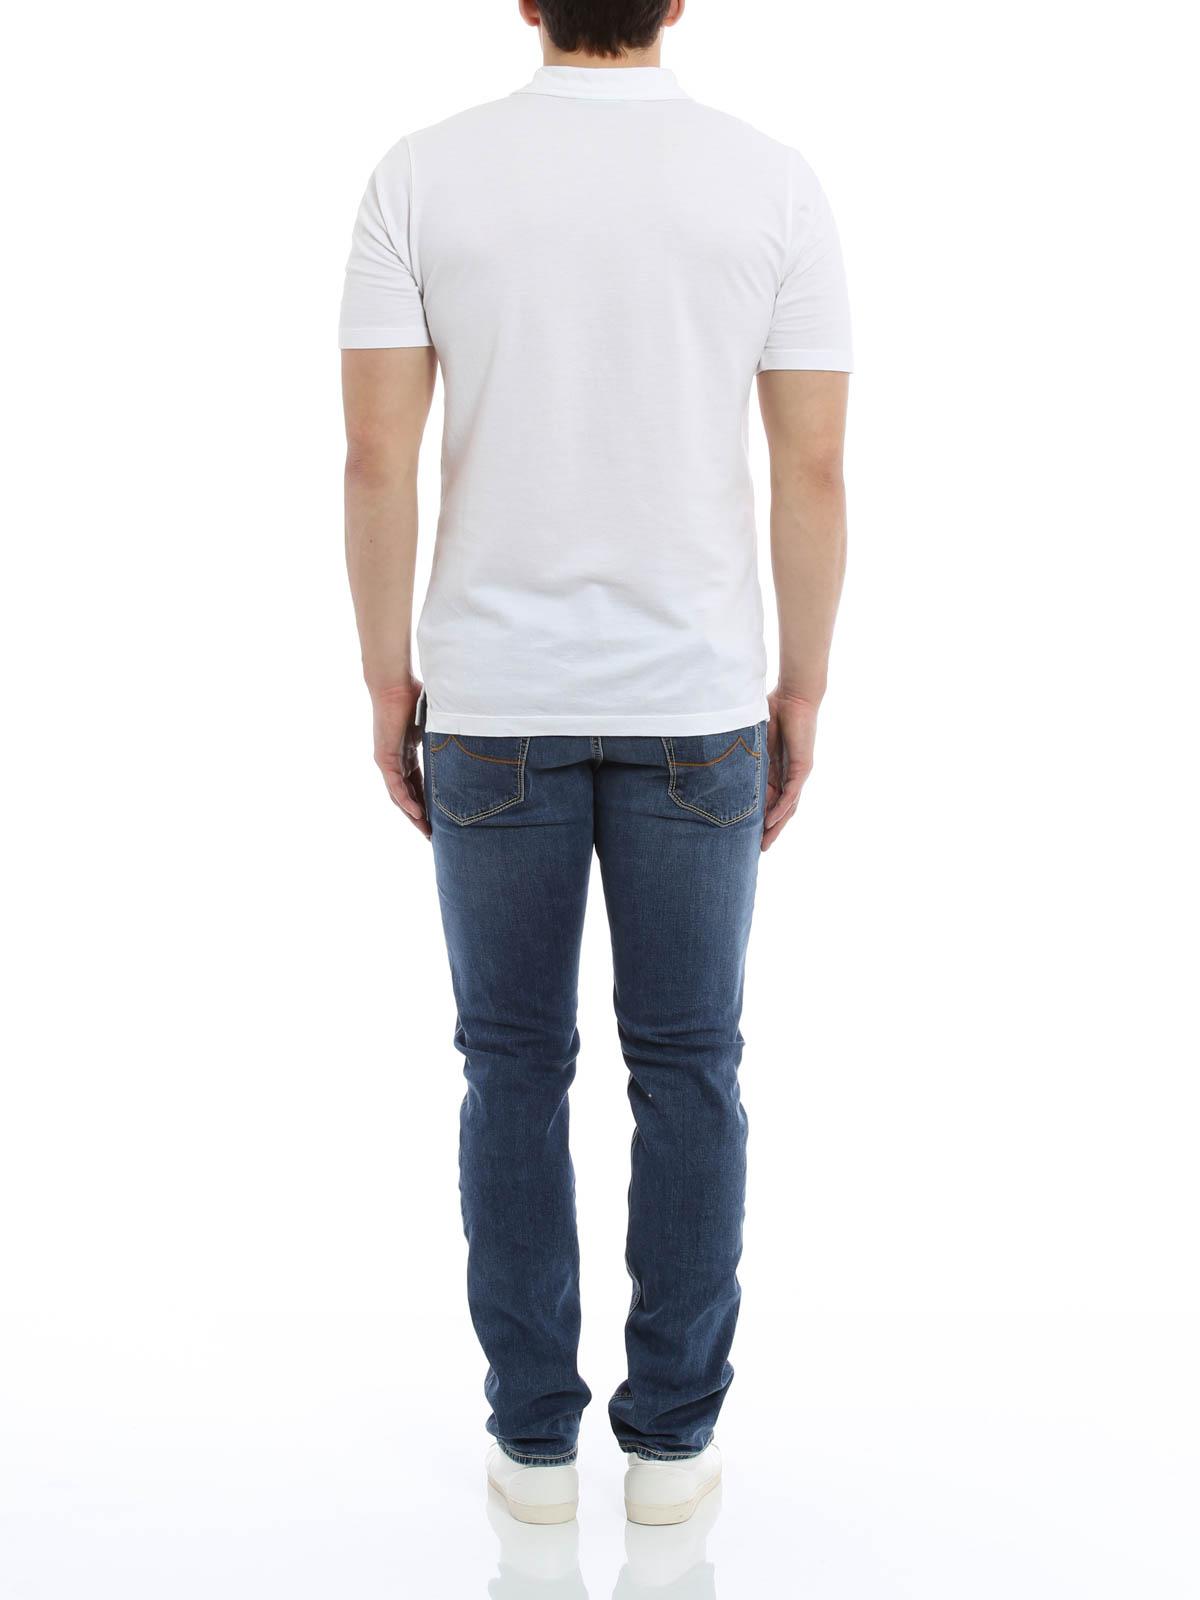 jeans sartoriale jacob cohen jeans dritti a sigaretta. Black Bedroom Furniture Sets. Home Design Ideas